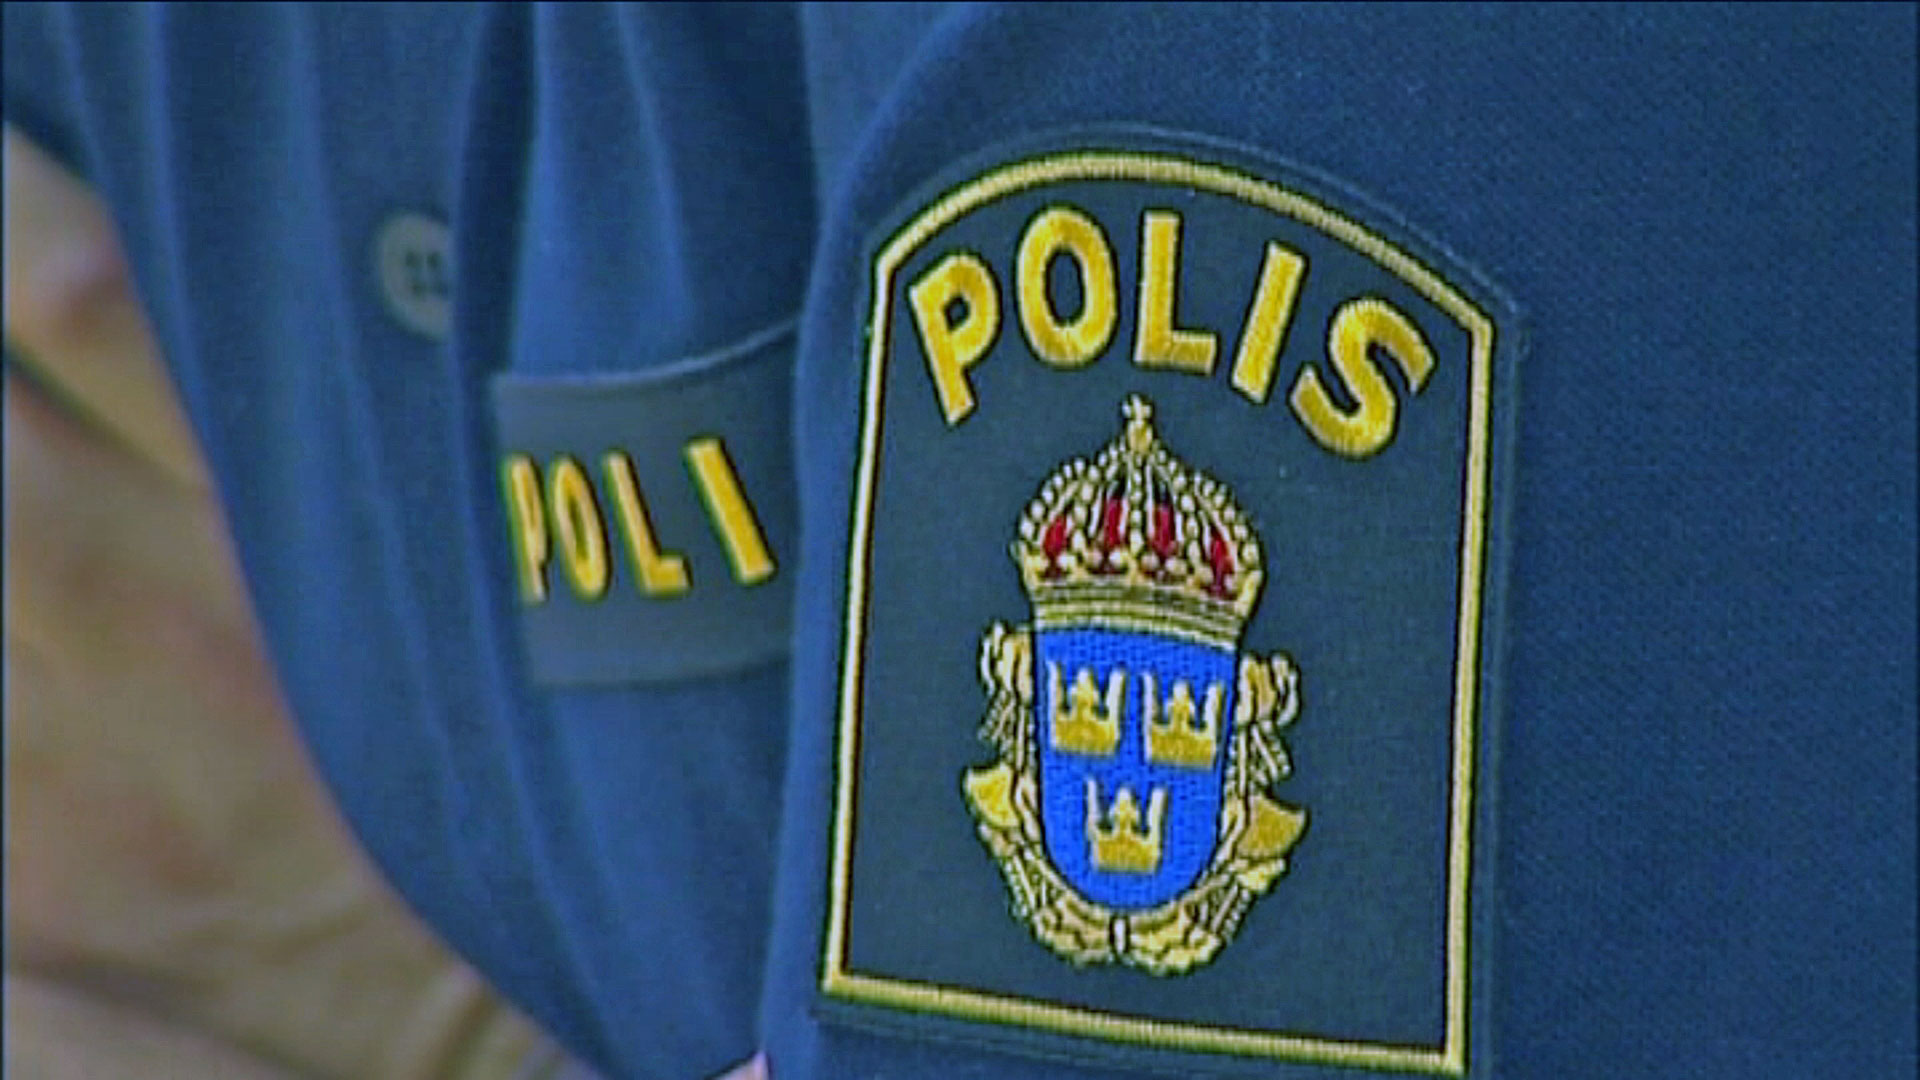 Polis atalas for dataintrang